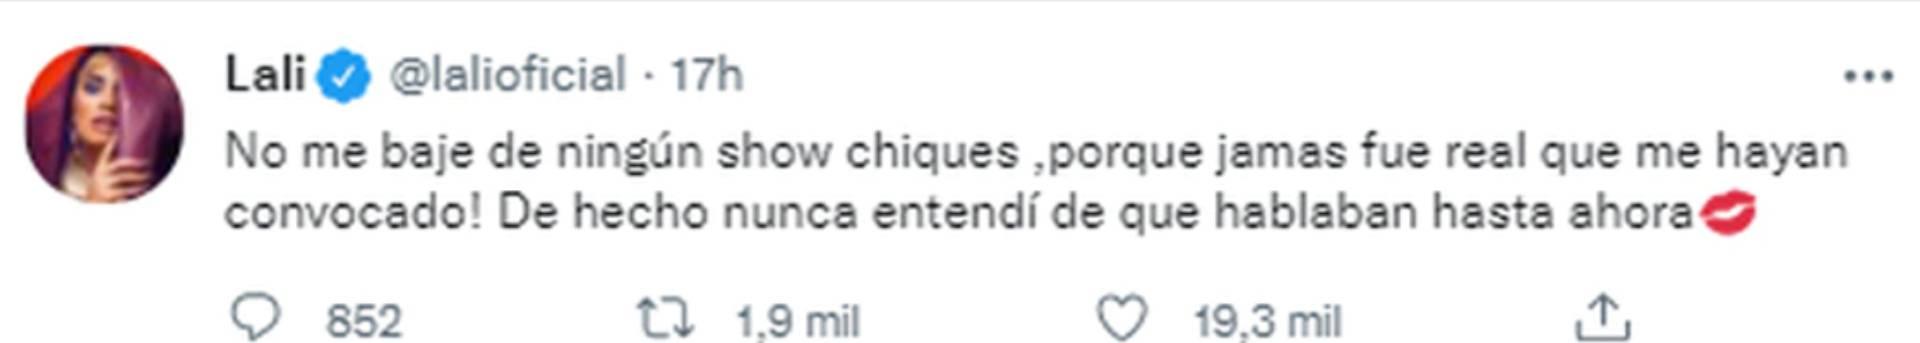 El tuit de Lali